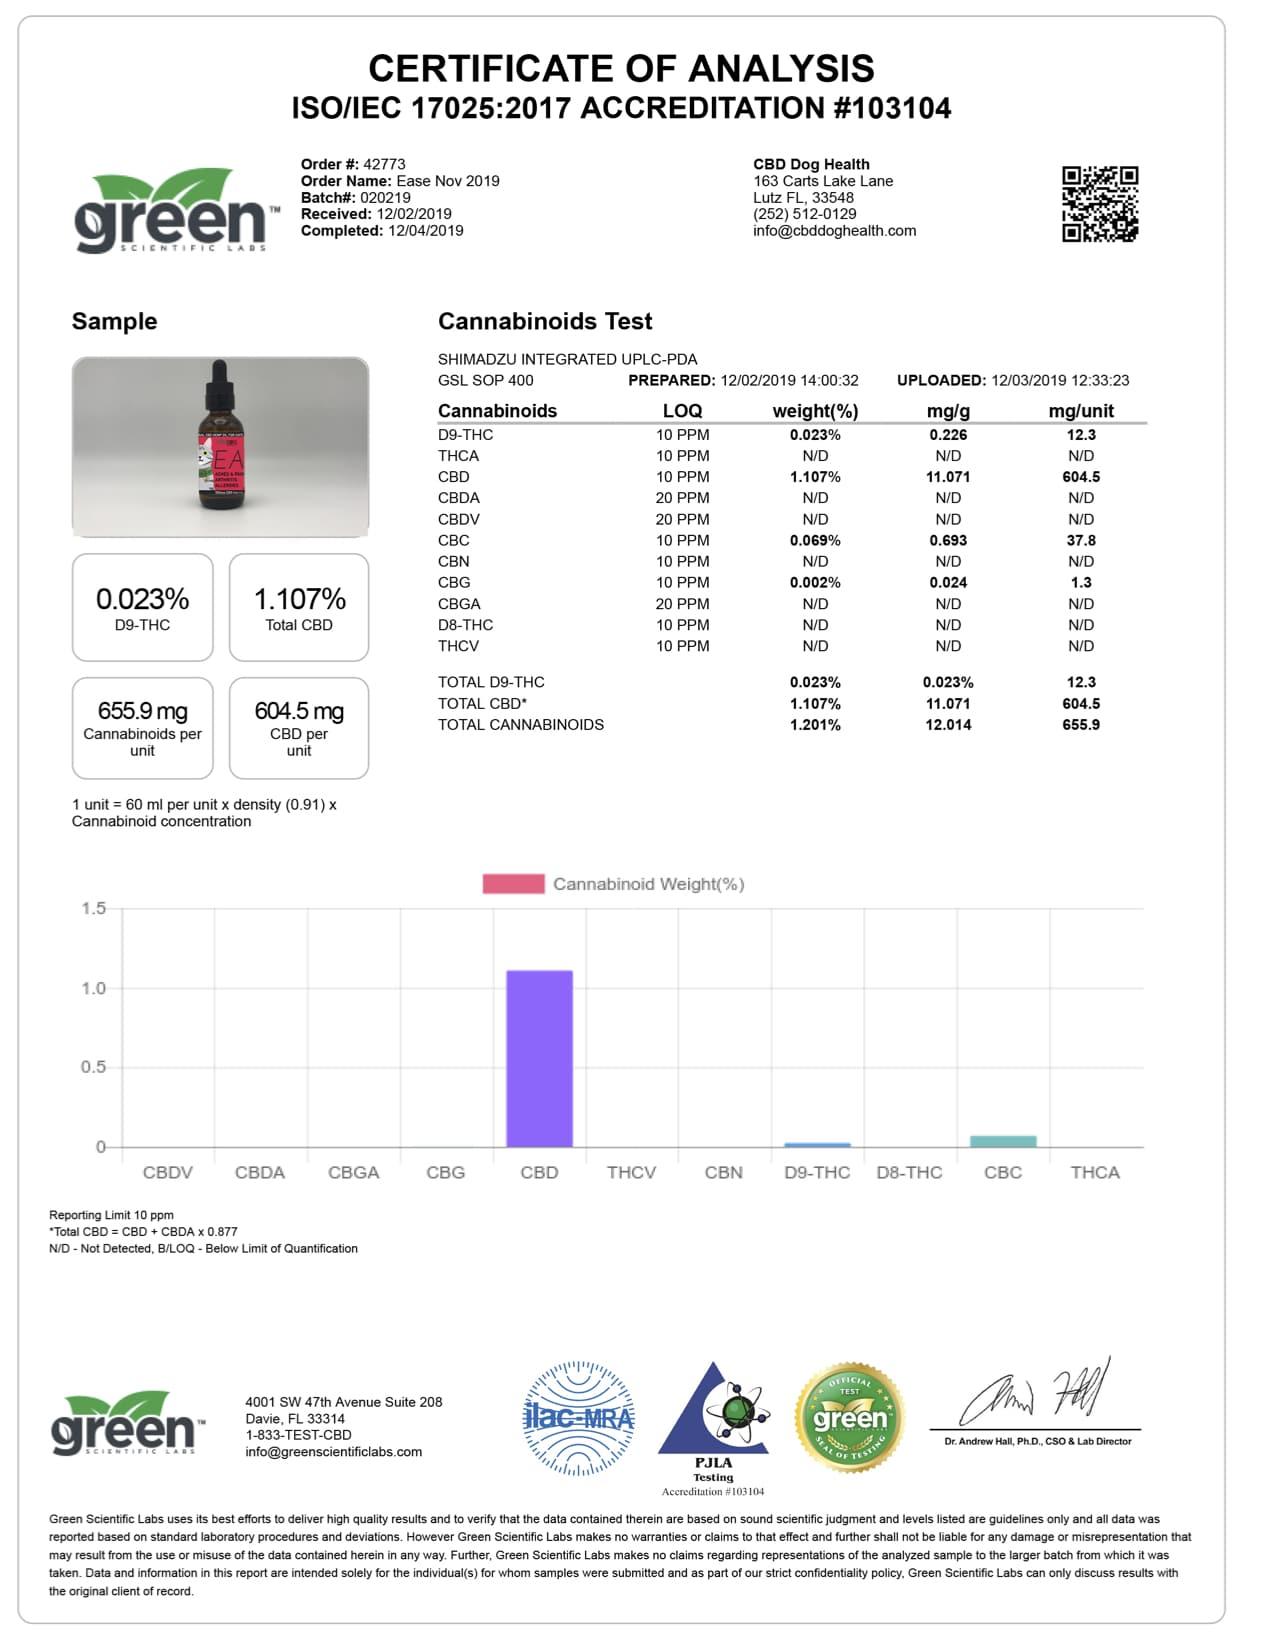 EASE CAT 12 04 19 GreenScientificLabs Batch020219 copy